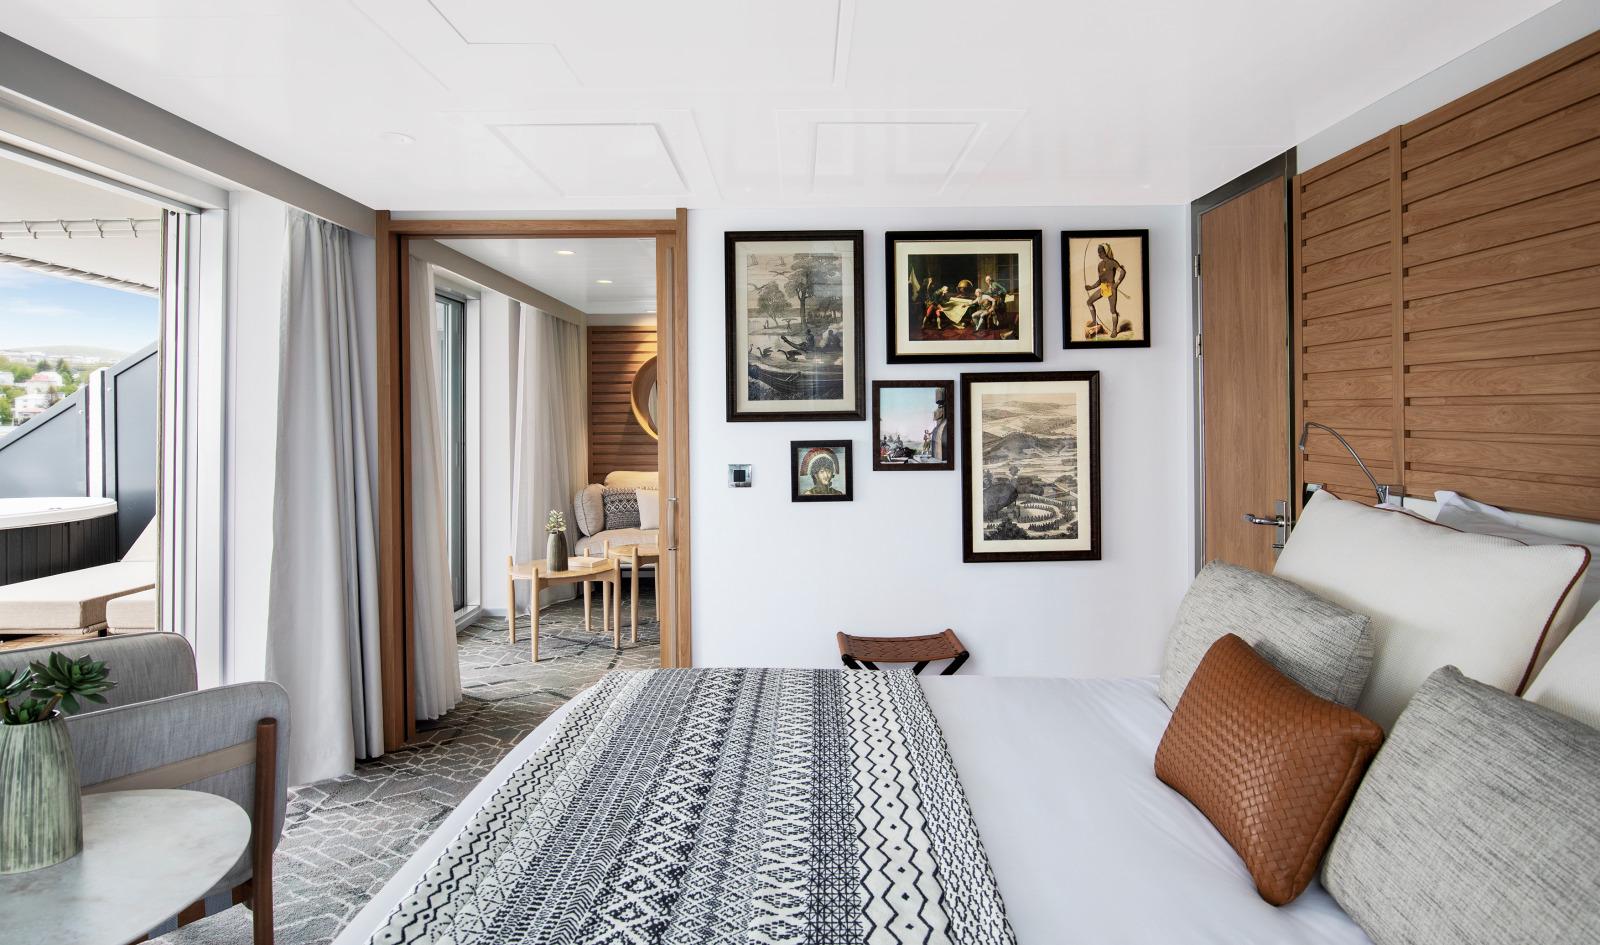 Owner's Suite SA - Le Laperouse - Bild 1 - Thumb